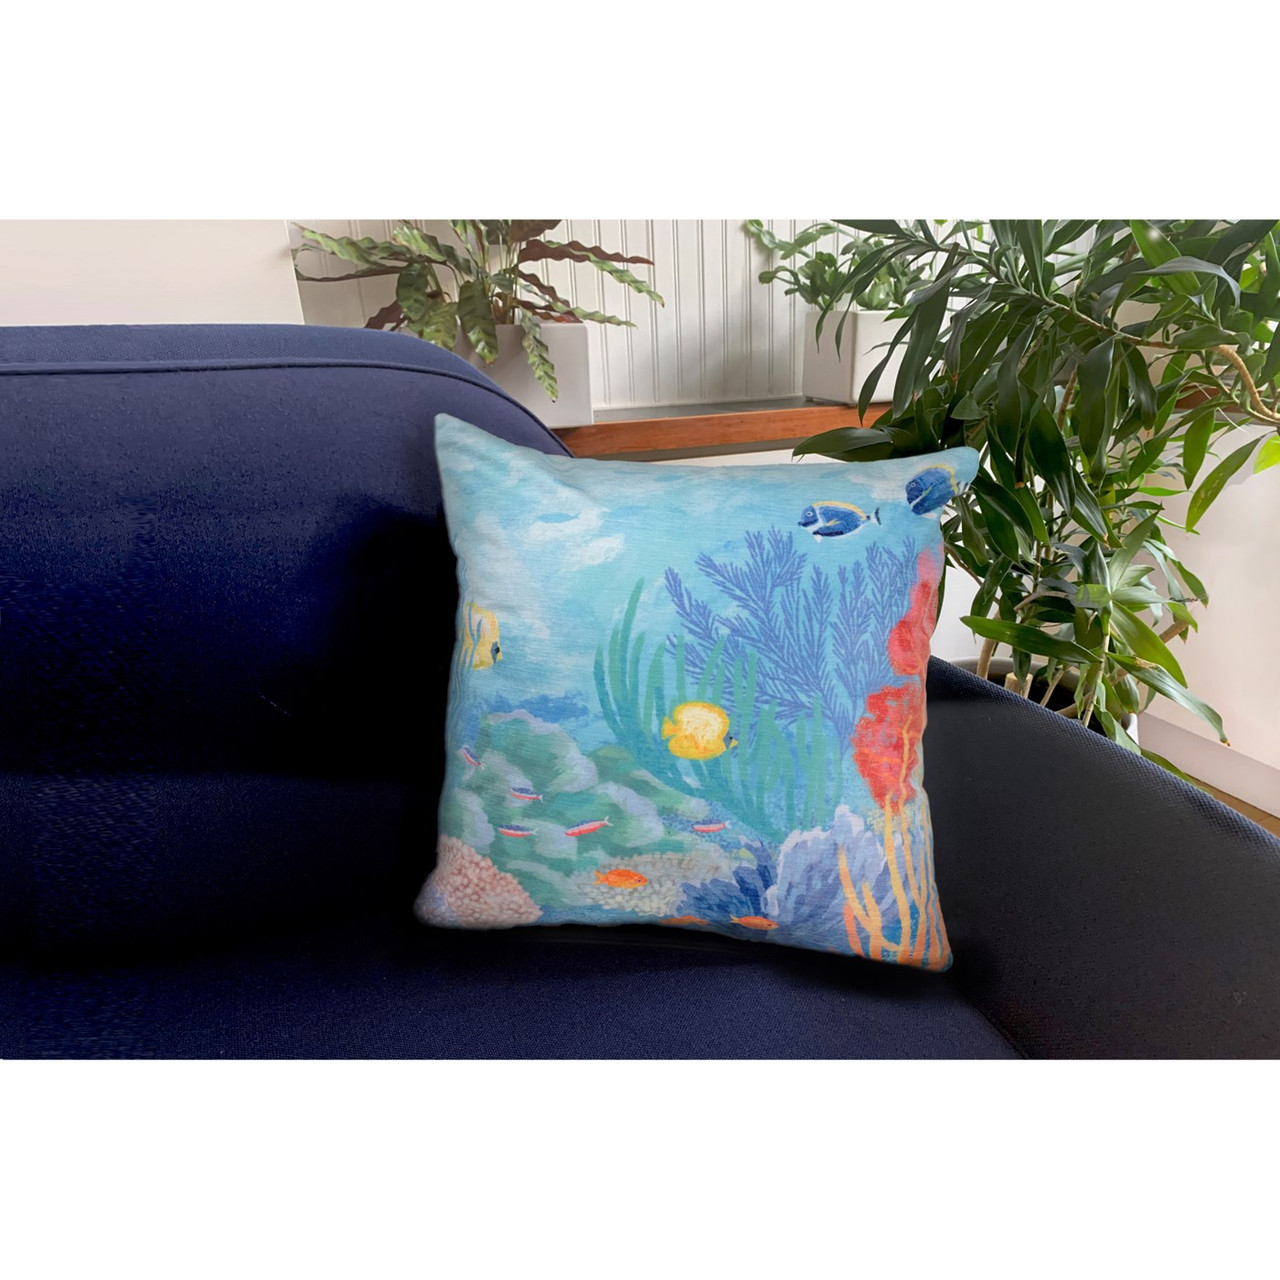 "Illusions Seascape Indoor/Outdoor Throw Pillow - 18"" Square"